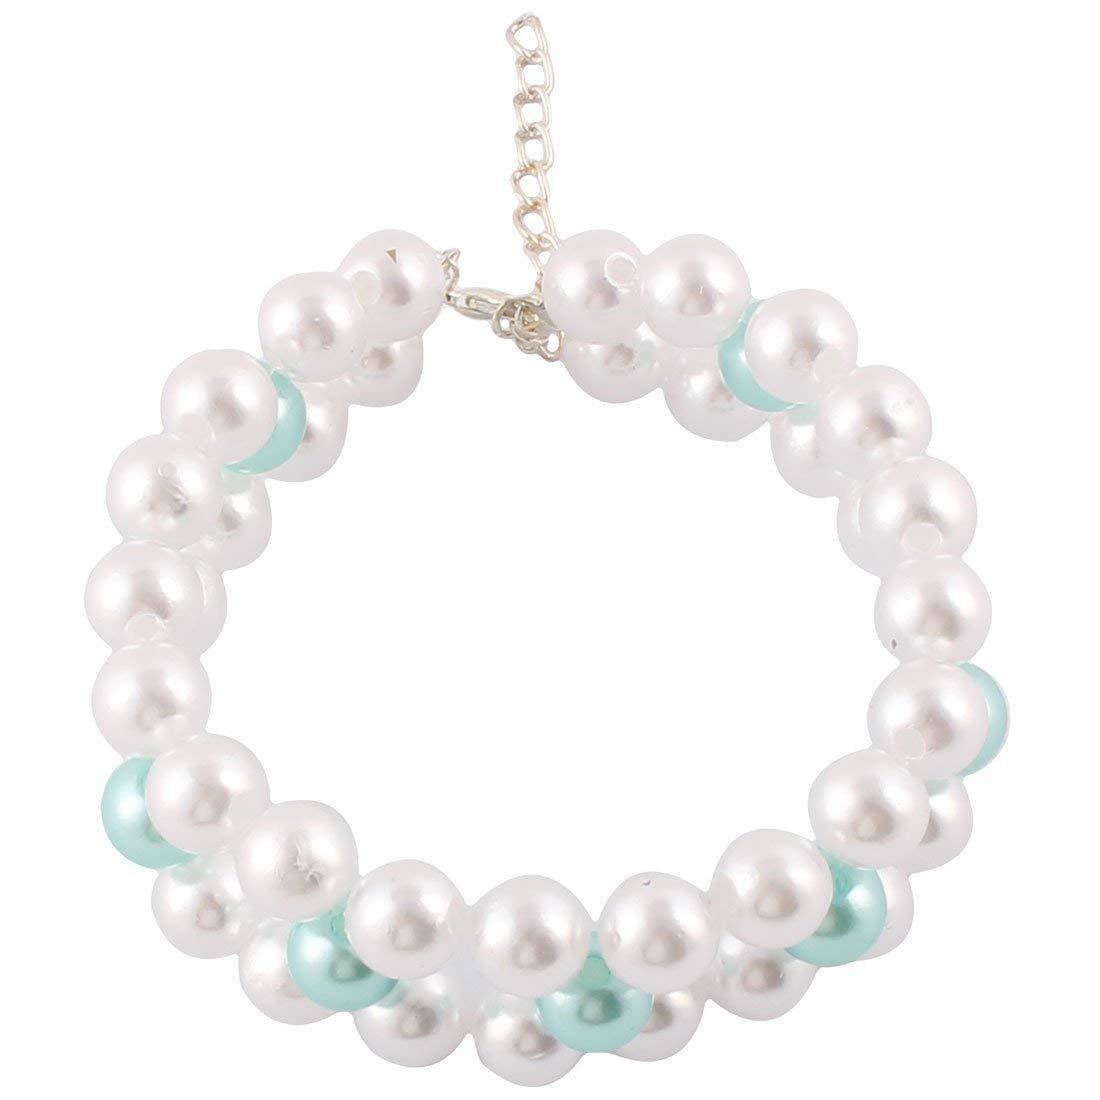 1Pc White,Silver Tone Metal Beads Linked Rhinestone Inlaid Heart Shaped Pendant Decor Dog Necklace